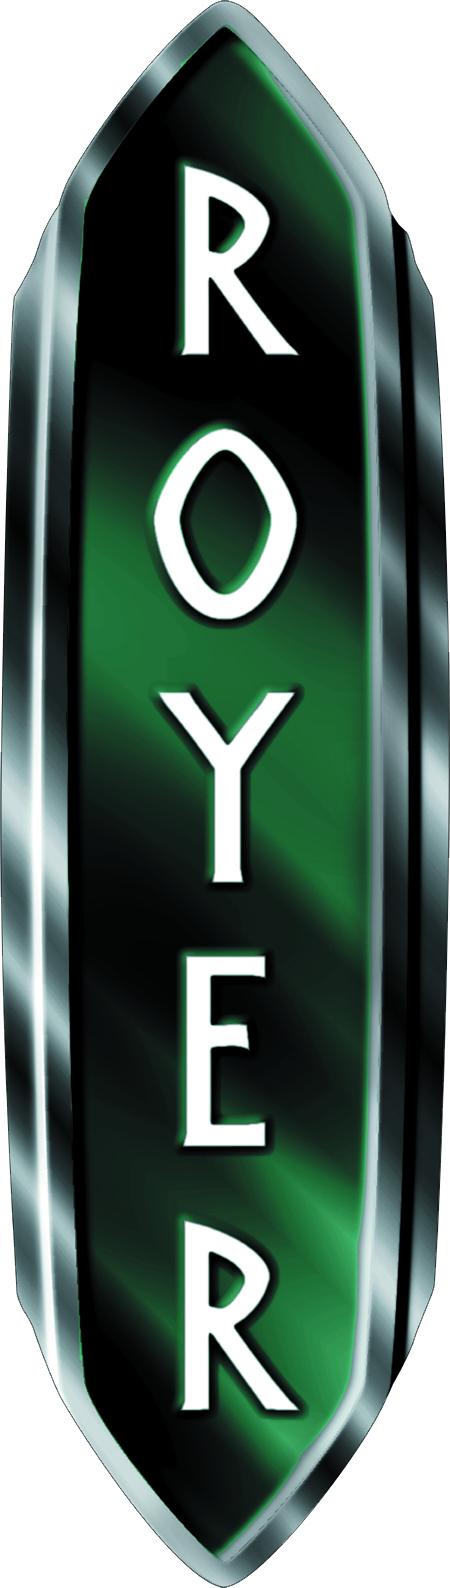 Royer-logo-Lg.jpg